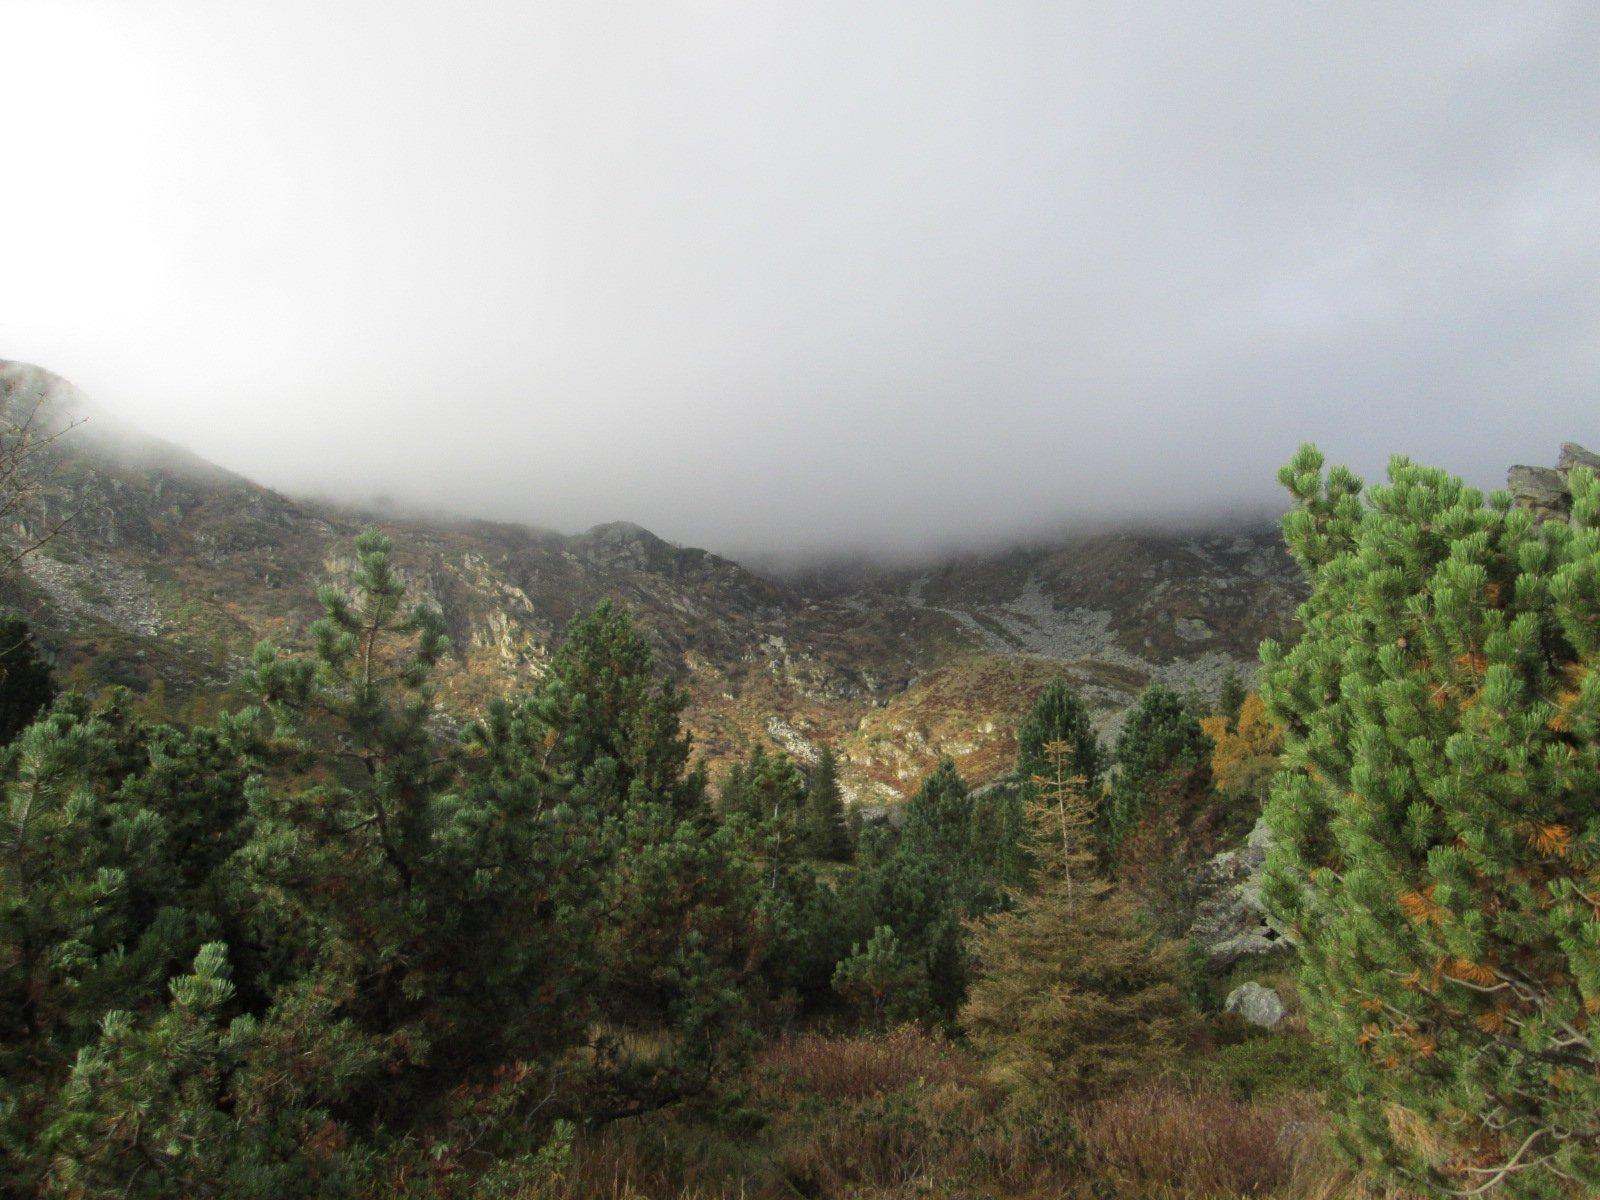 la nebbia incombe